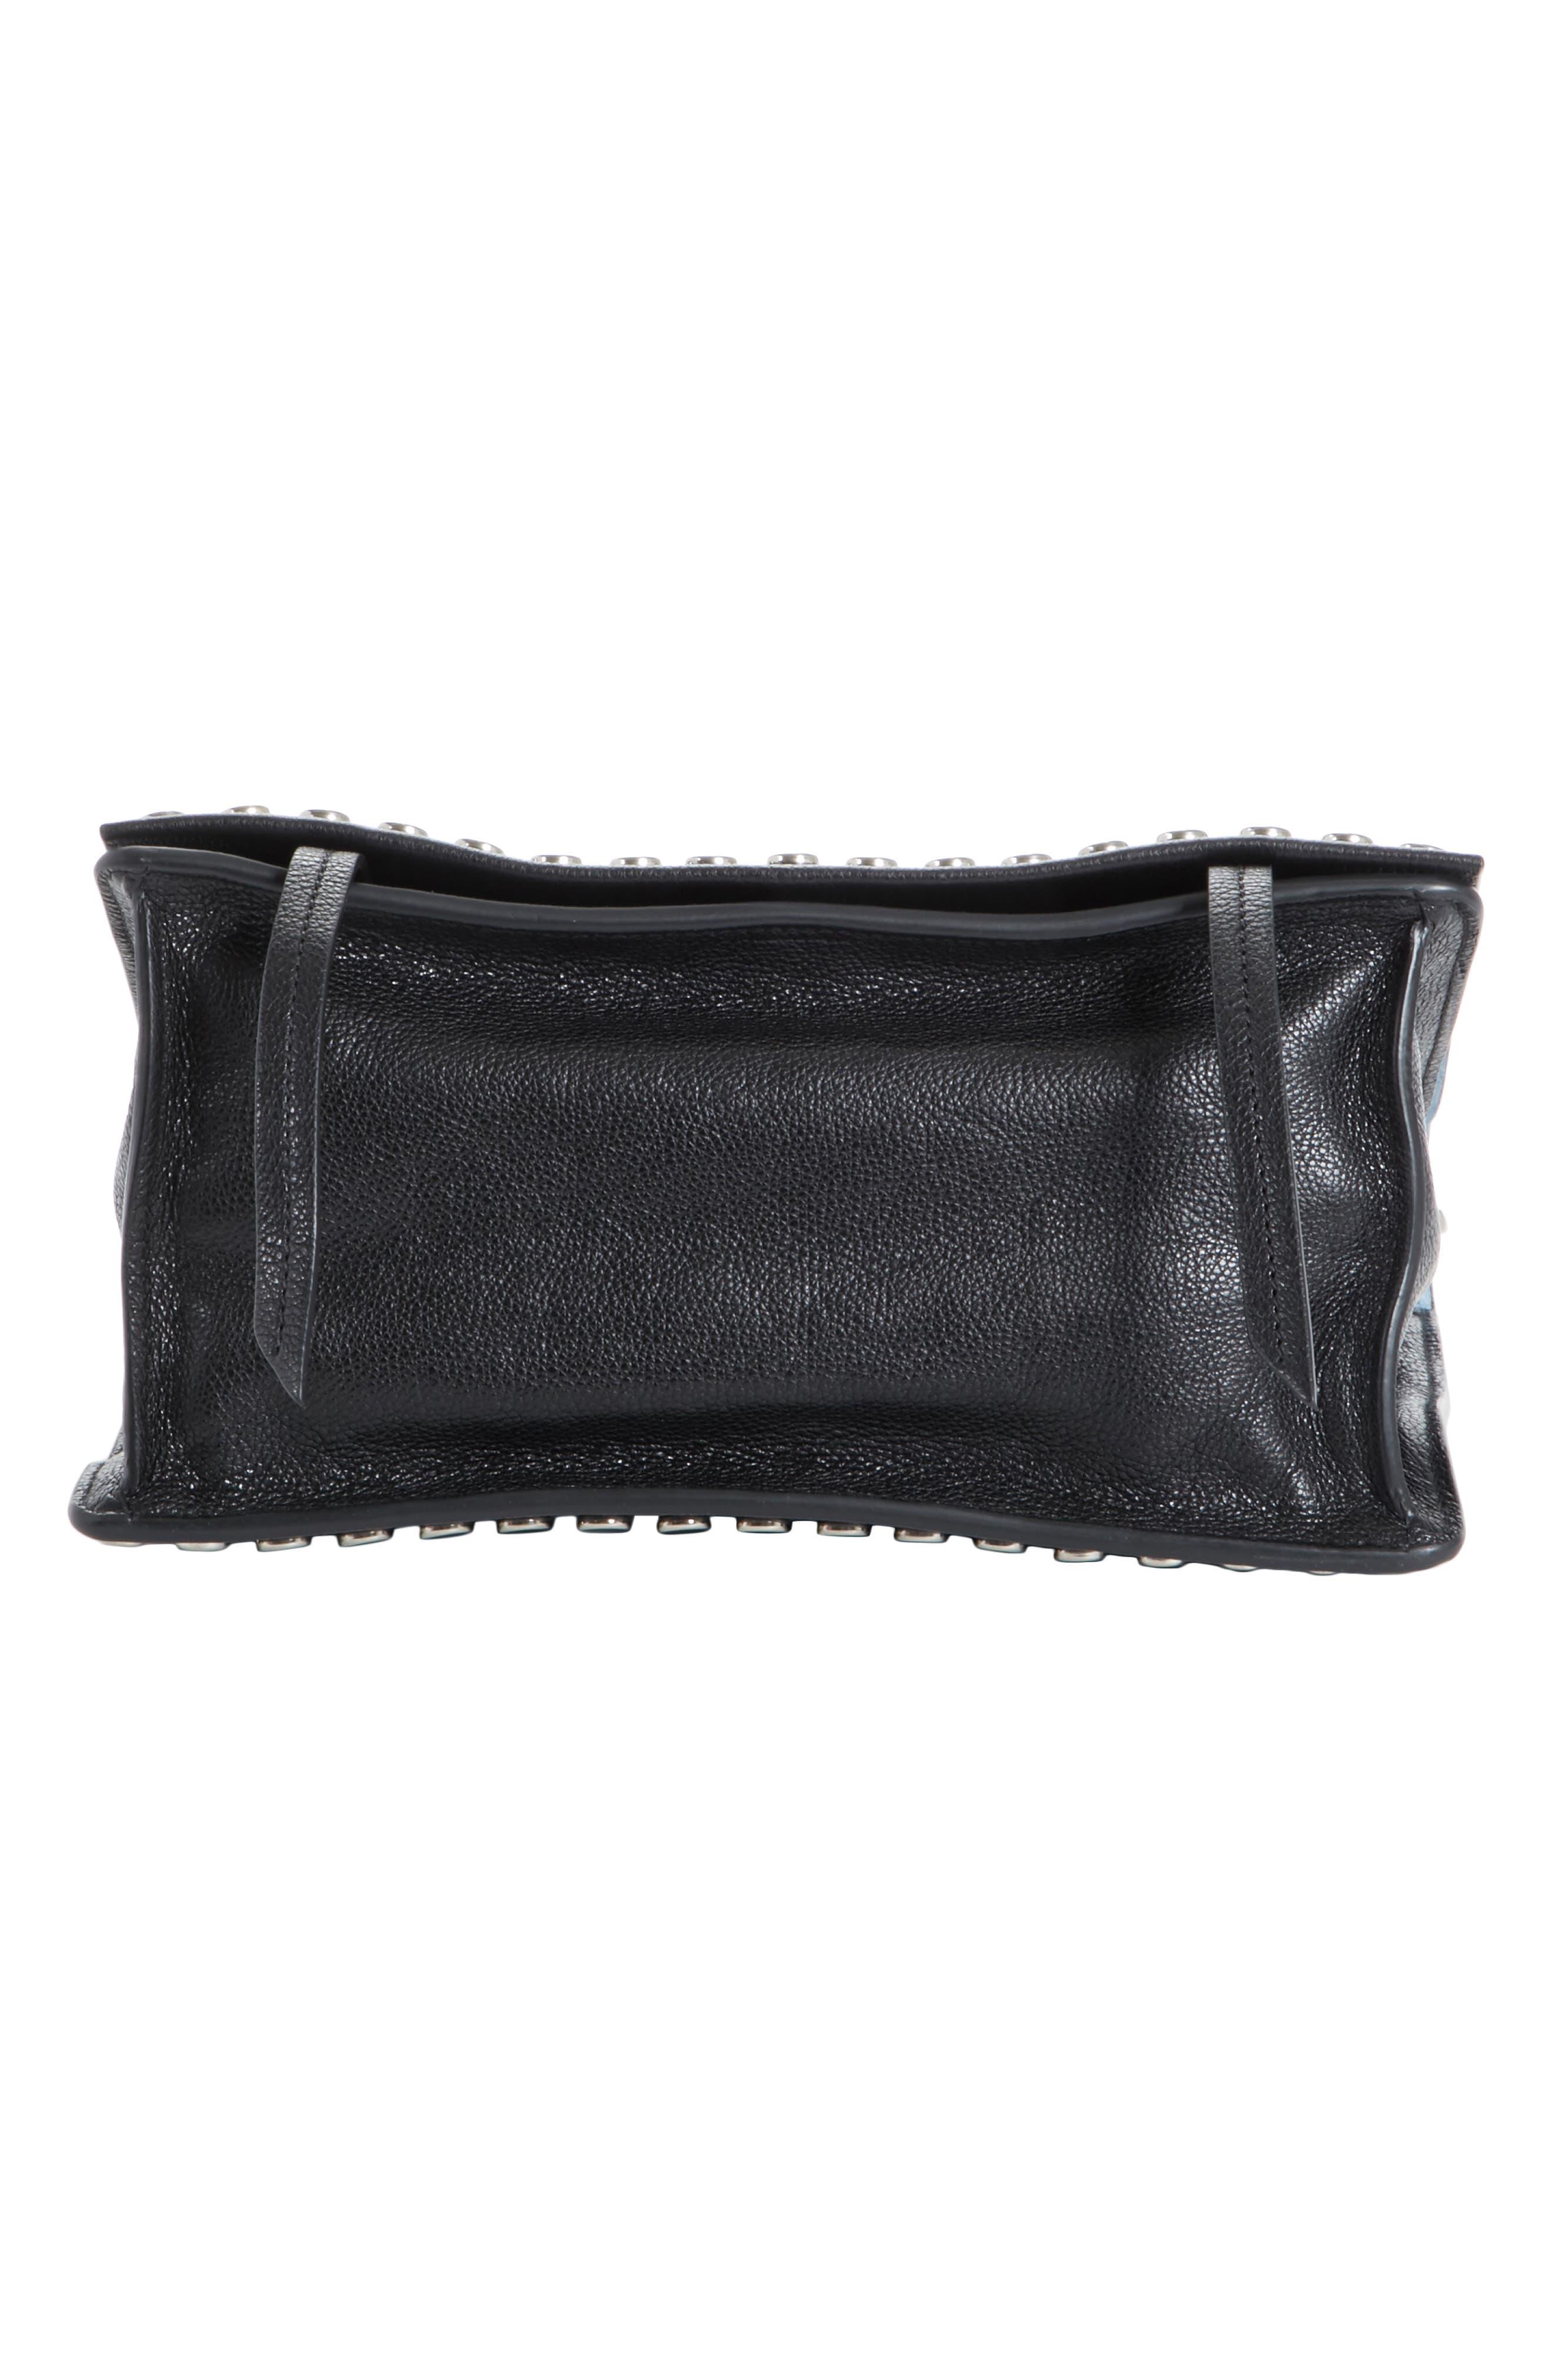 Small Stud Etiquette Shoulder Bag,                             Alternate thumbnail 5, color,                             NERO/ ASTRALE